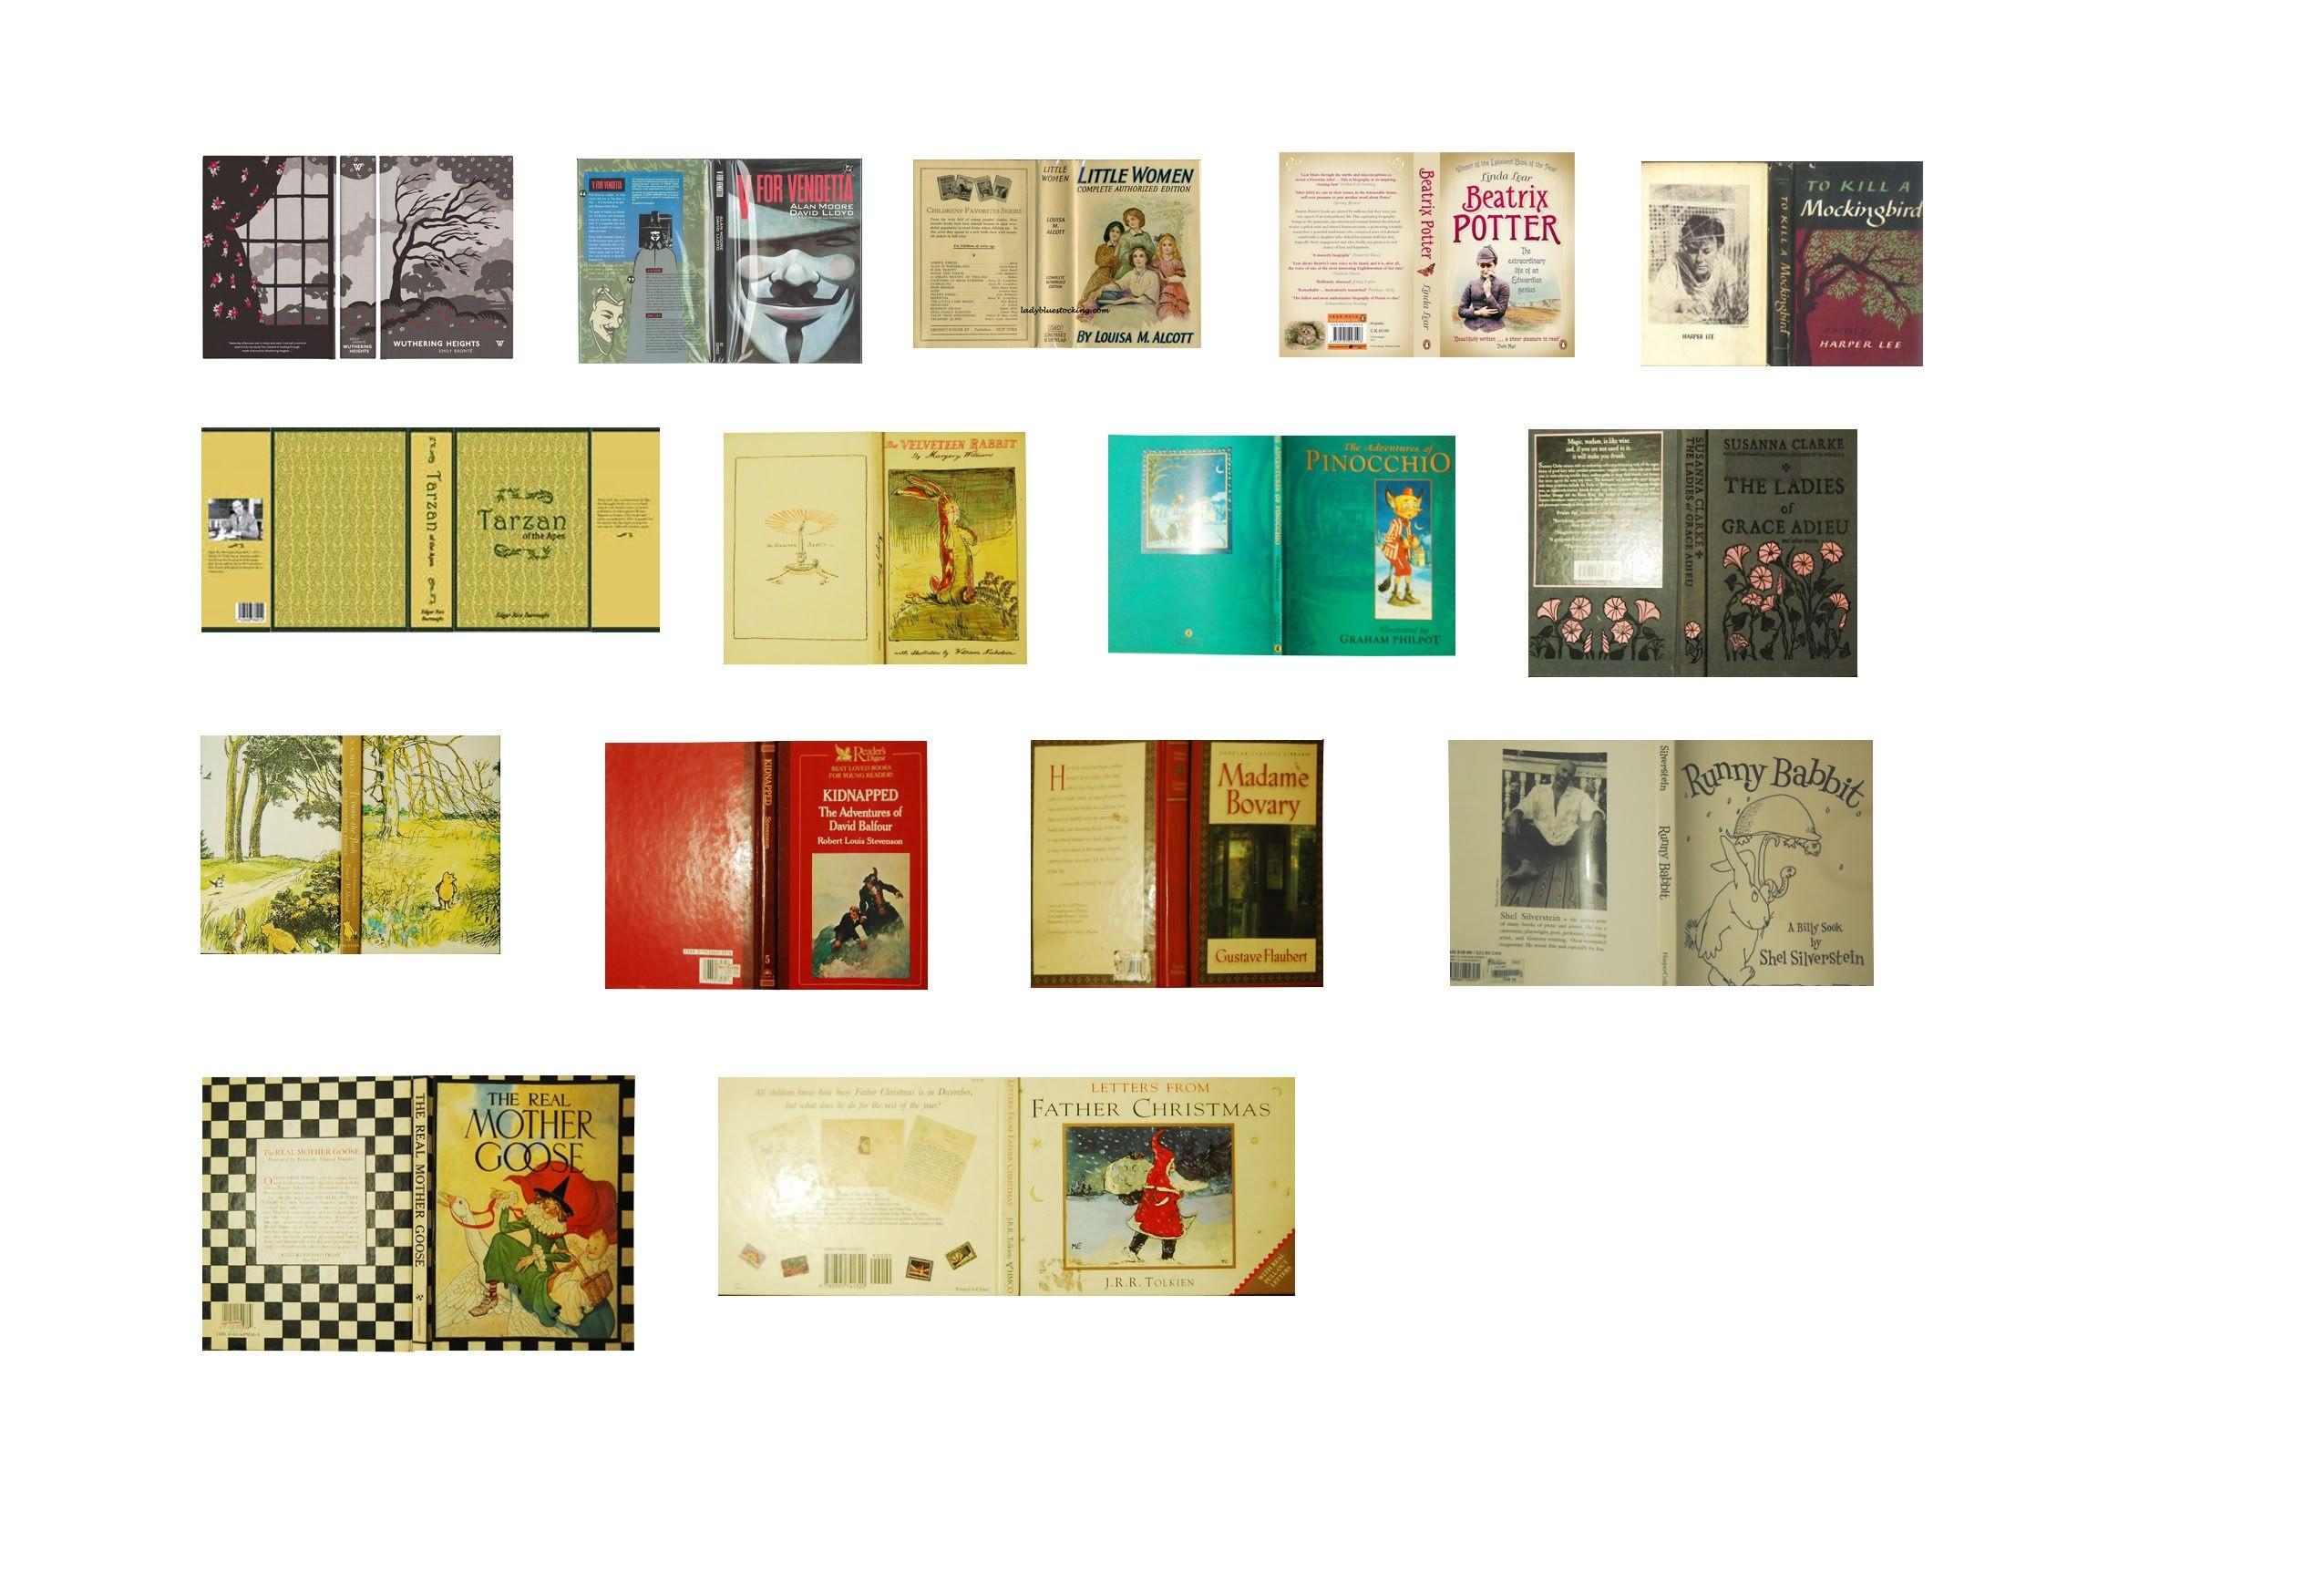 Pintori Kois On Doll Stuff | Doll House Crafts, Mini Books - Free Printable Miniature Book Covers